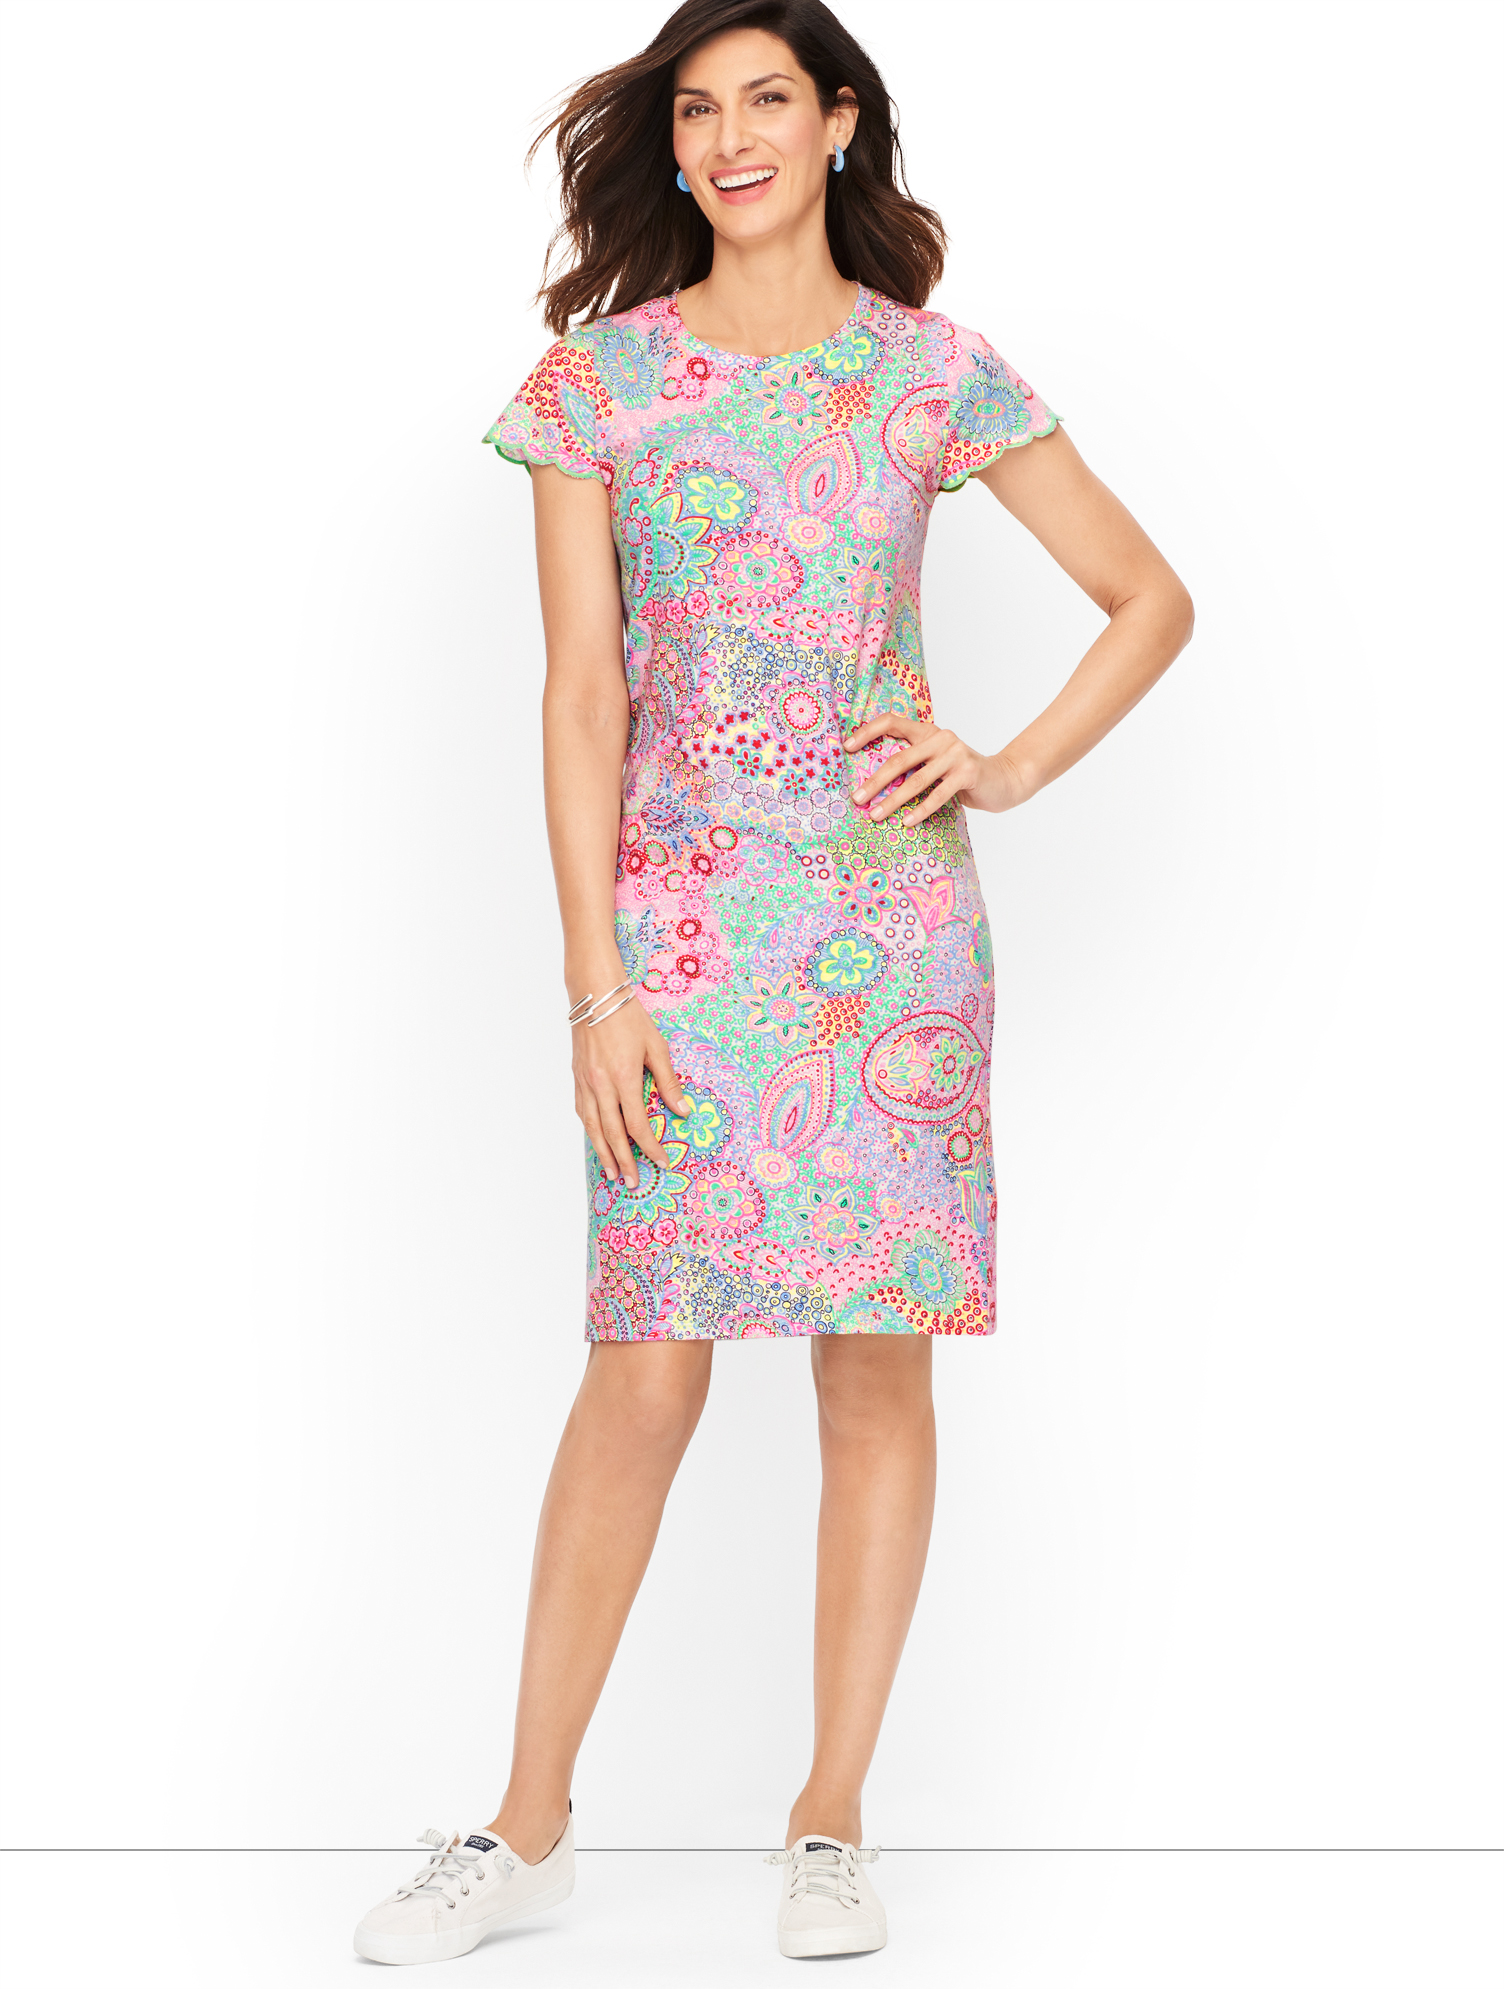 60s 70s Plus Size Dresses, Clothing, Costumes Paisley Shift Dress - Watermelon - 3X - 100 Cotton Talbots $109.00 AT vintagedancer.com